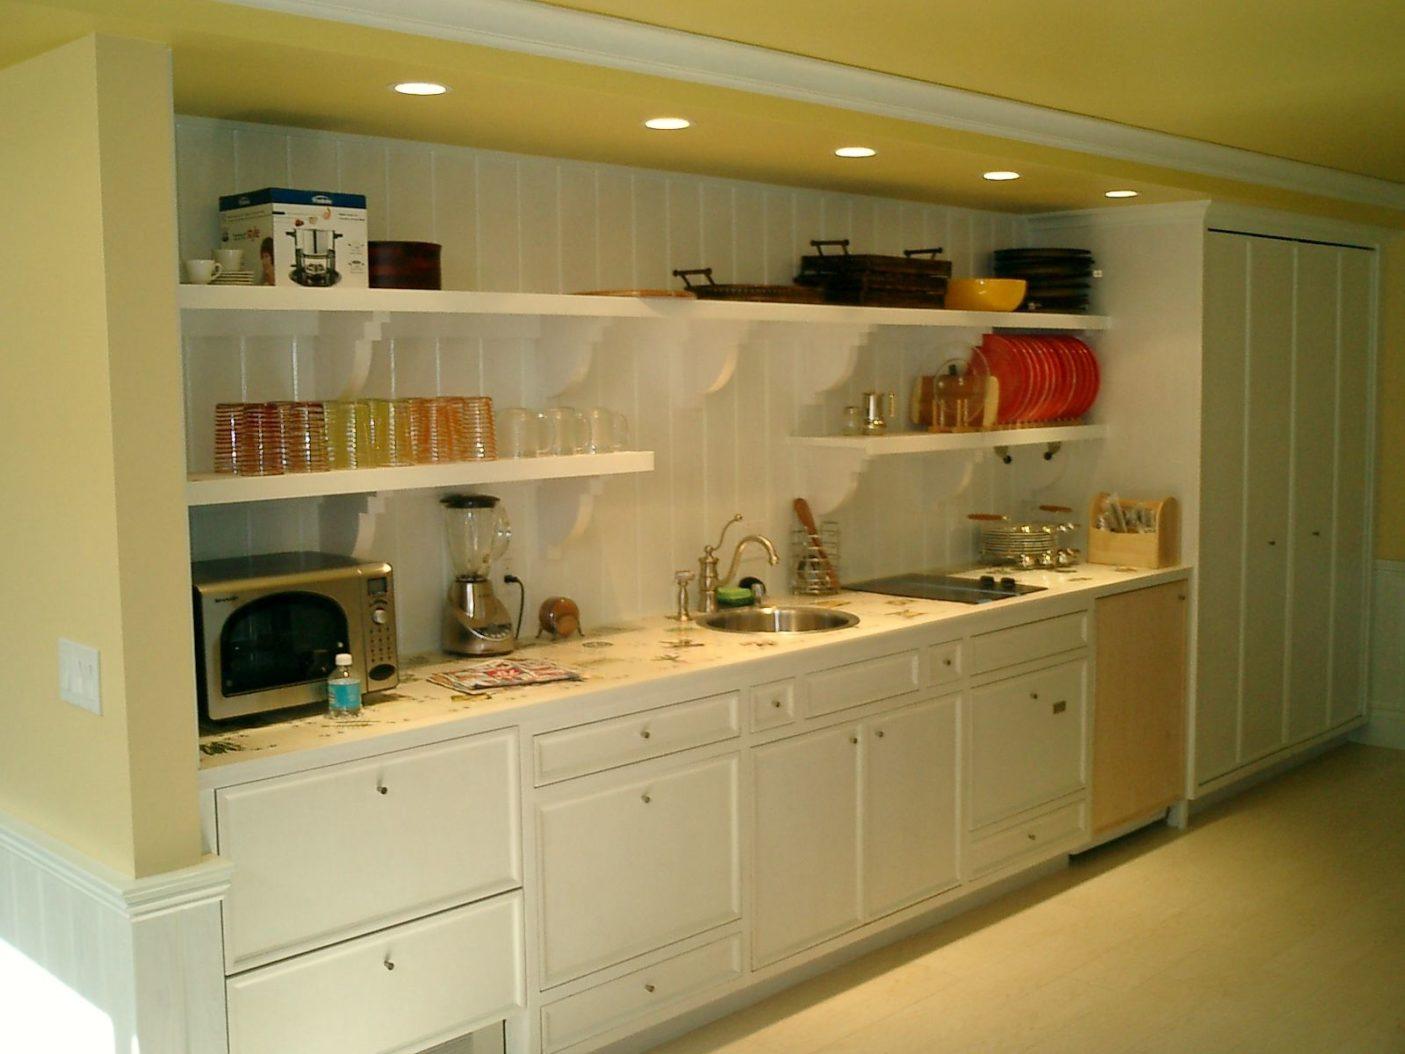 Kitchens-11.jpg